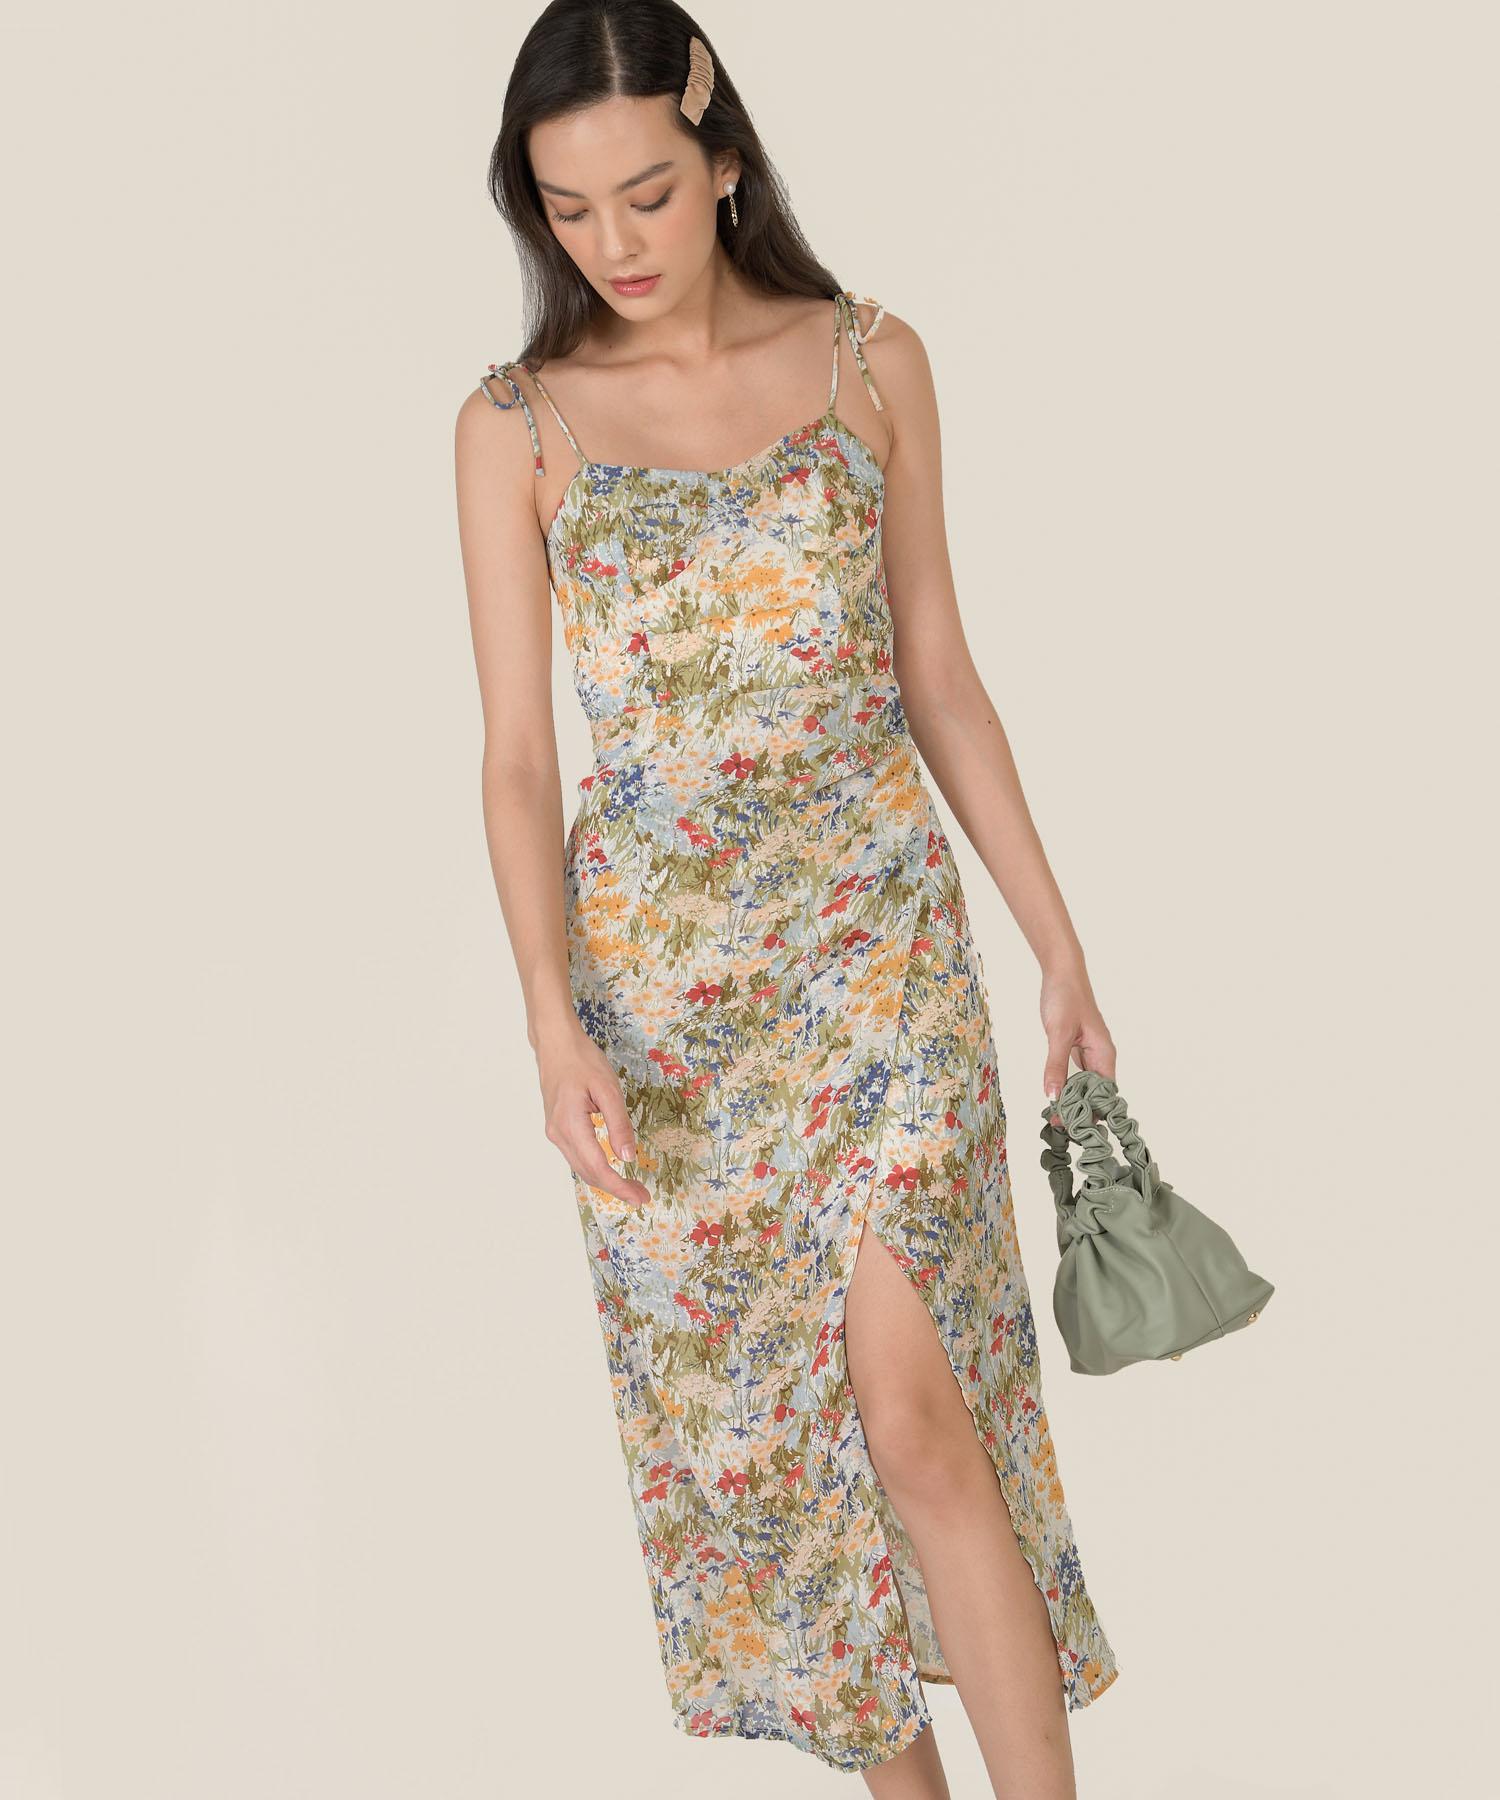 giada-floral-overlay-midi-dress-multi-1